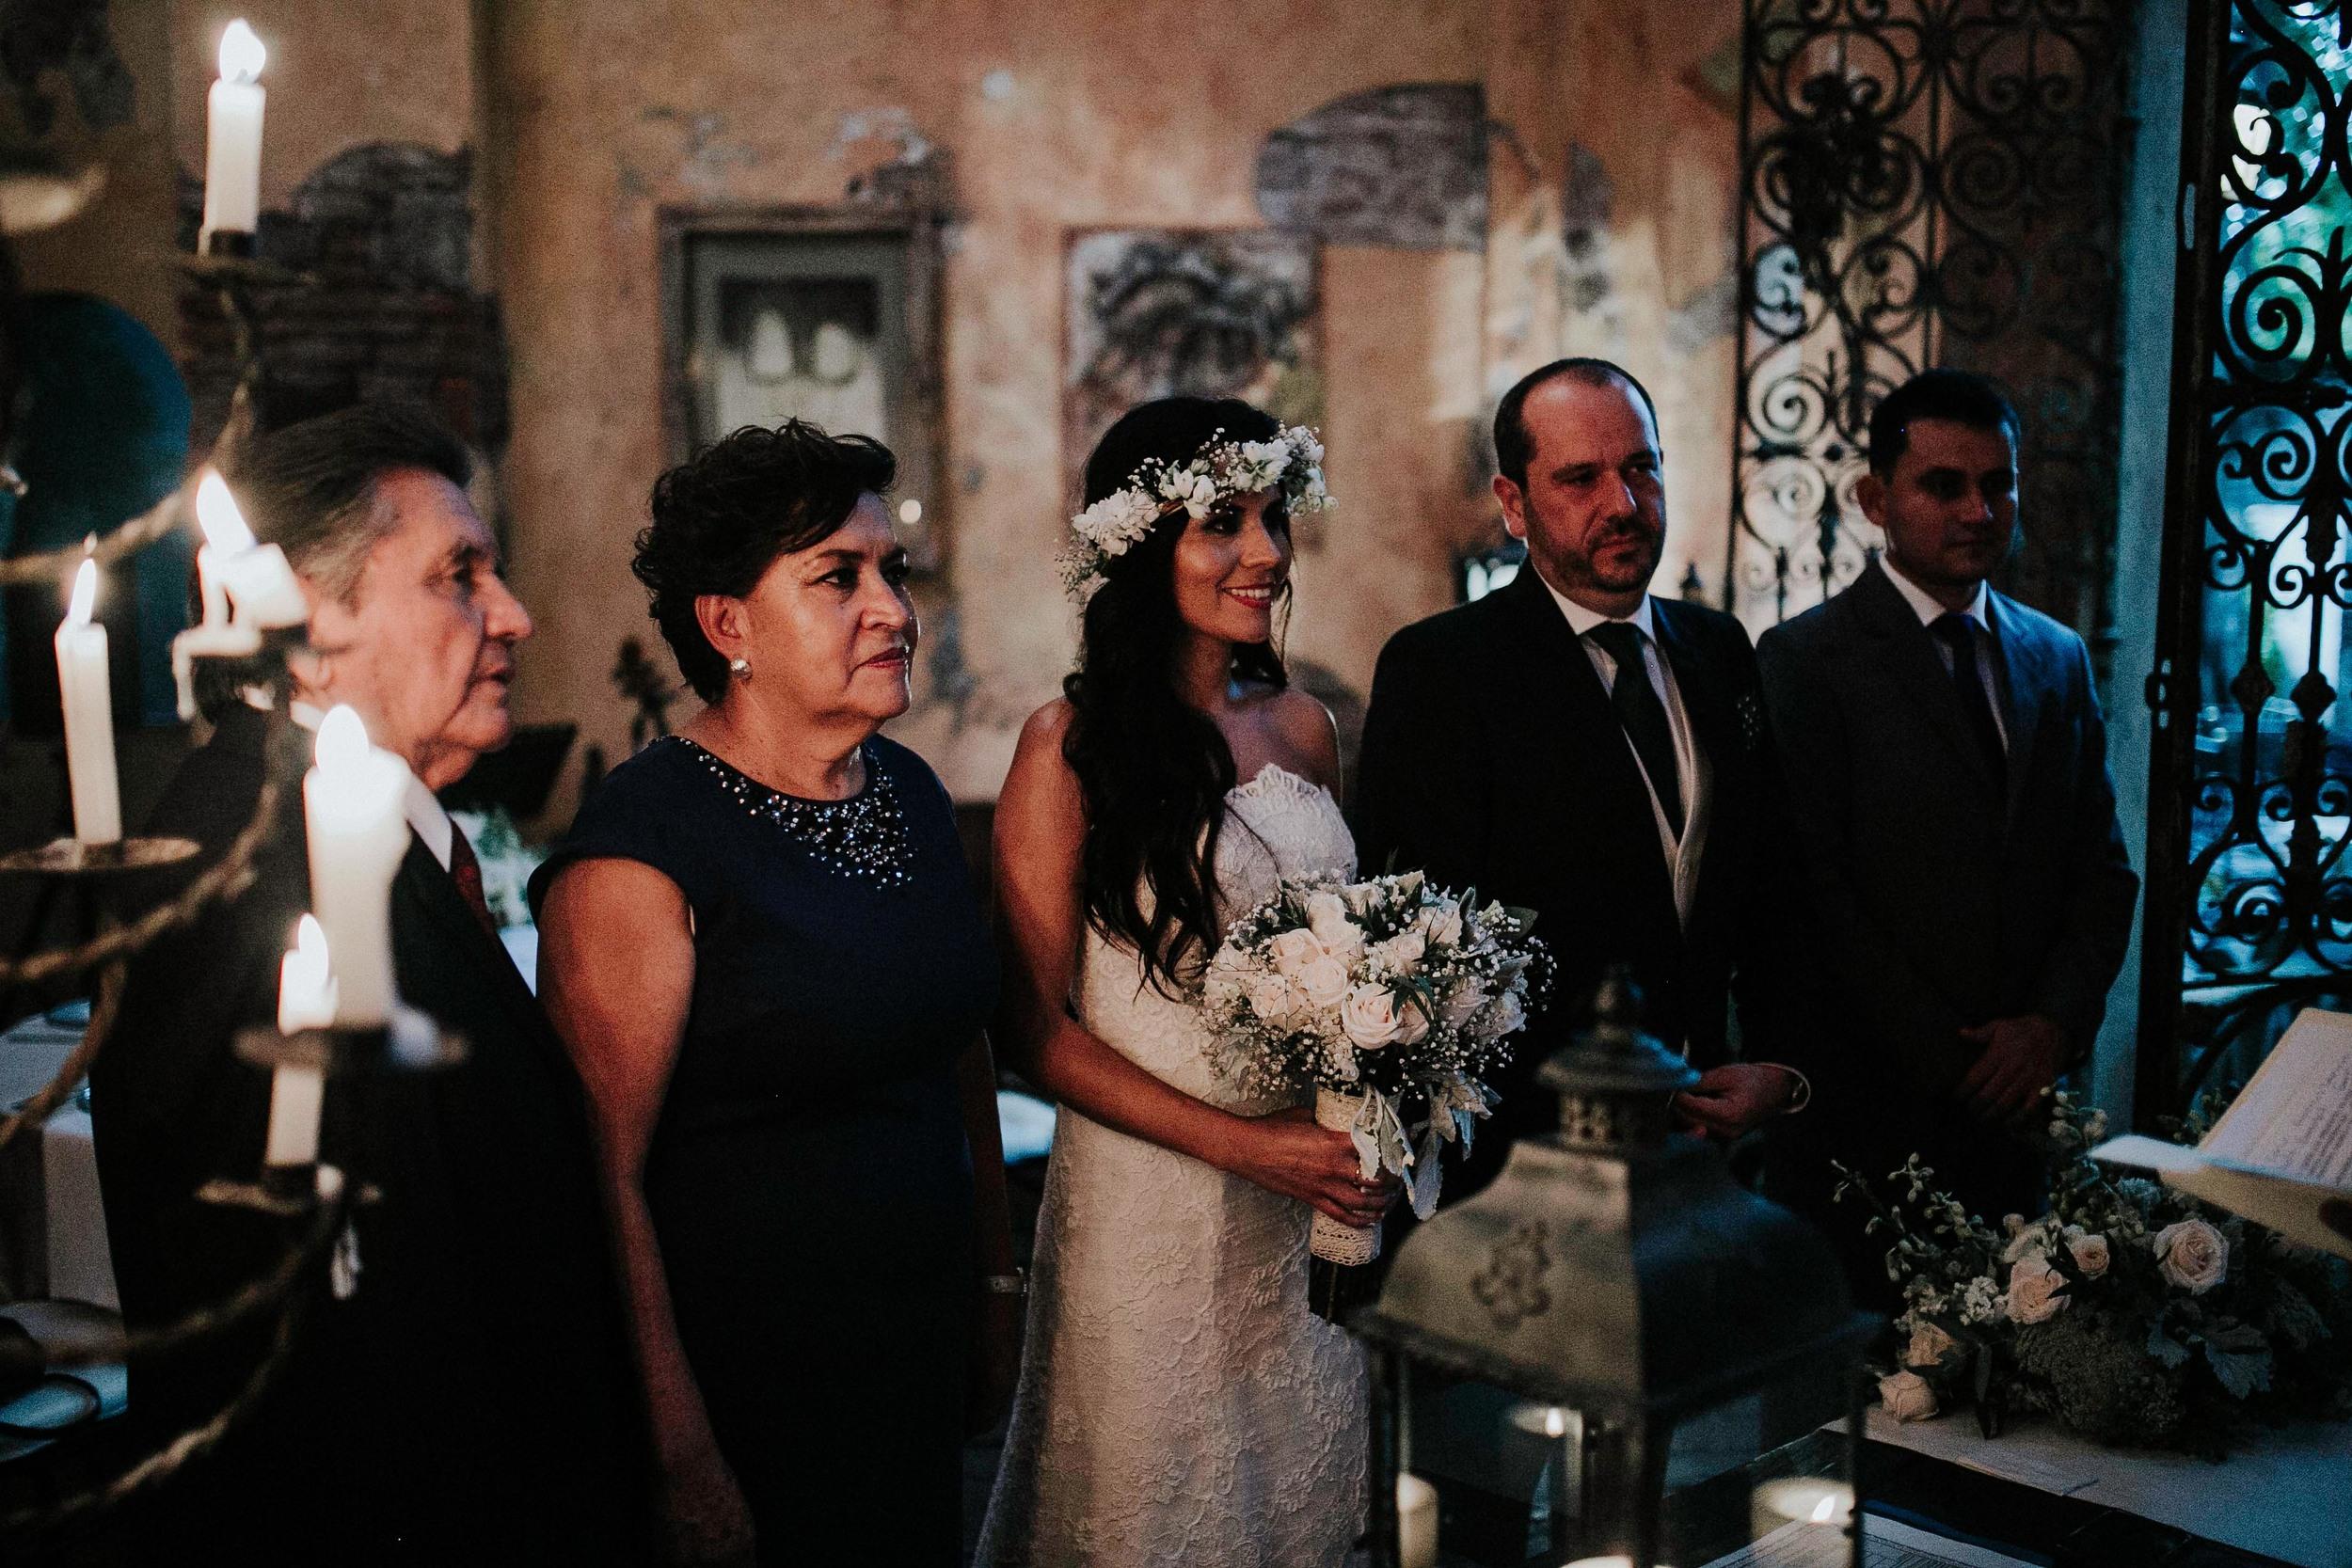 643A2067-Editaralfonso_flores_destination_wedding_photographer_San_gabriel_de_las_palmas.jpg